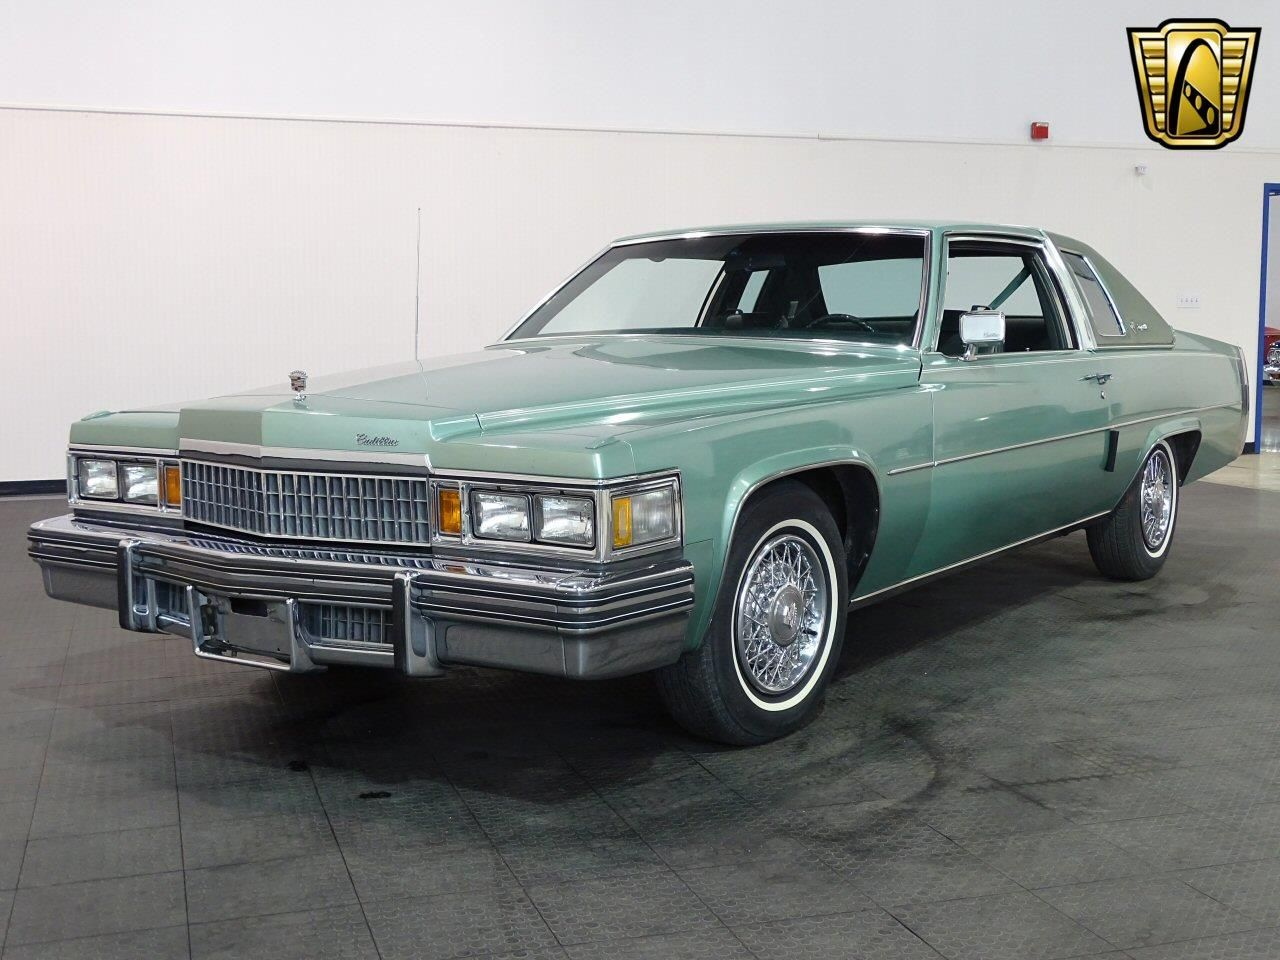 1978 Cadillac Coupe DeVille for Sale | ClassicCars.com | CC-975690 ...